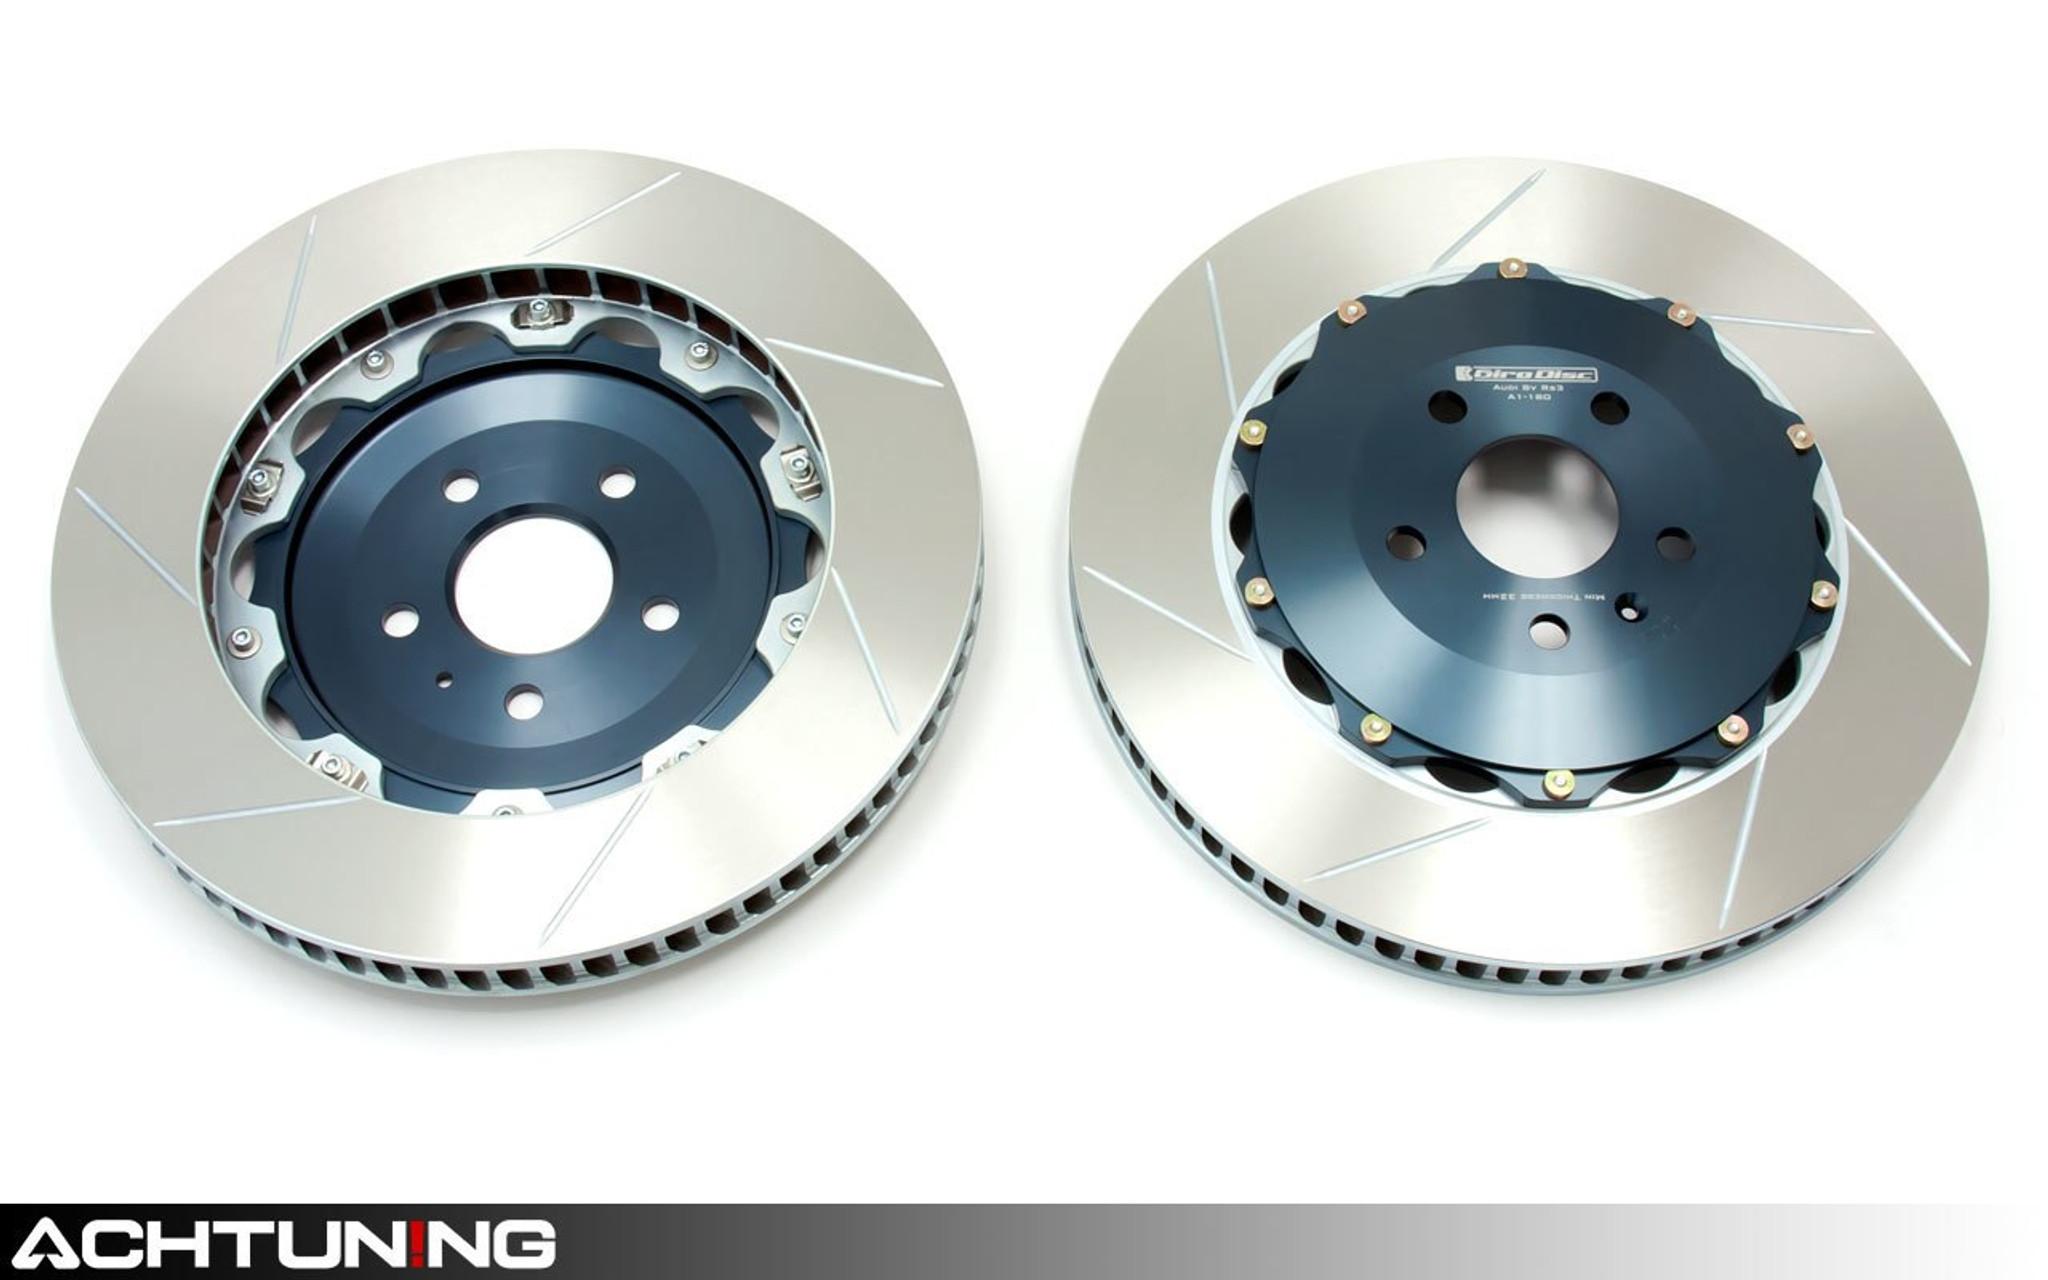 Front New Brake Rotors 4 2 Metallic Brake Pad Fits 2007-2011 2012 GMC Acadia